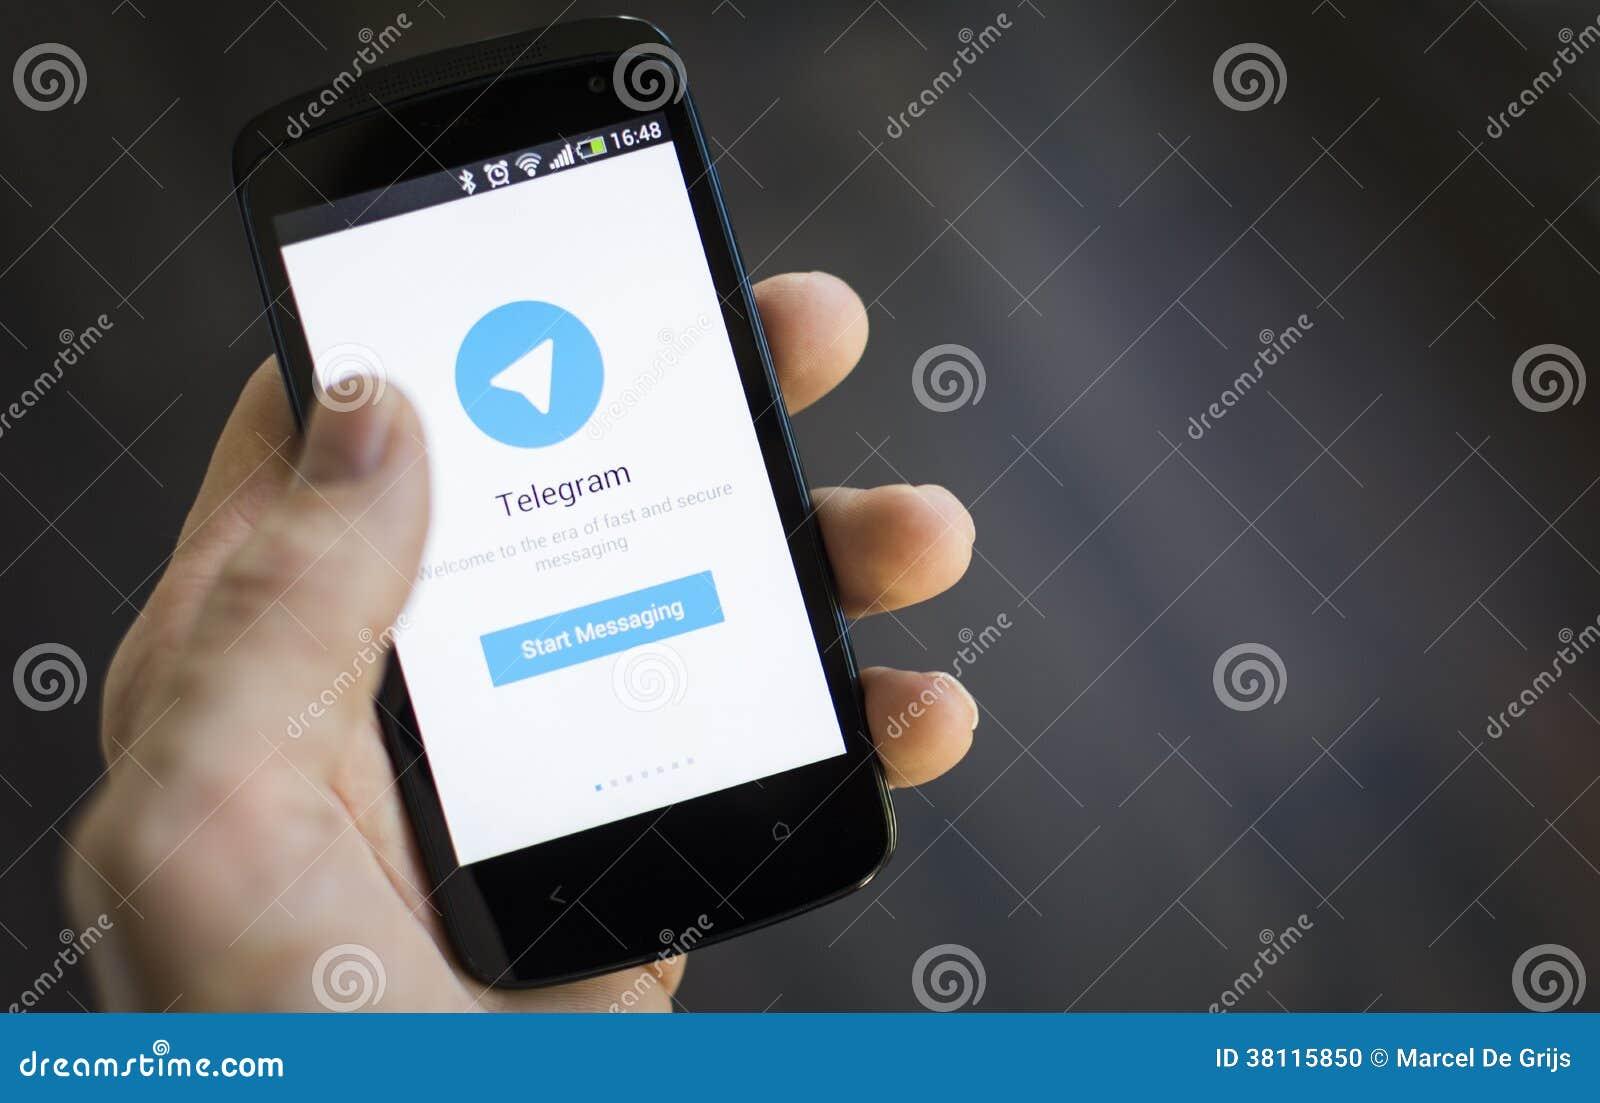 Telegram Mobile Application Editorial Image Image Of Send Messenger 38115850